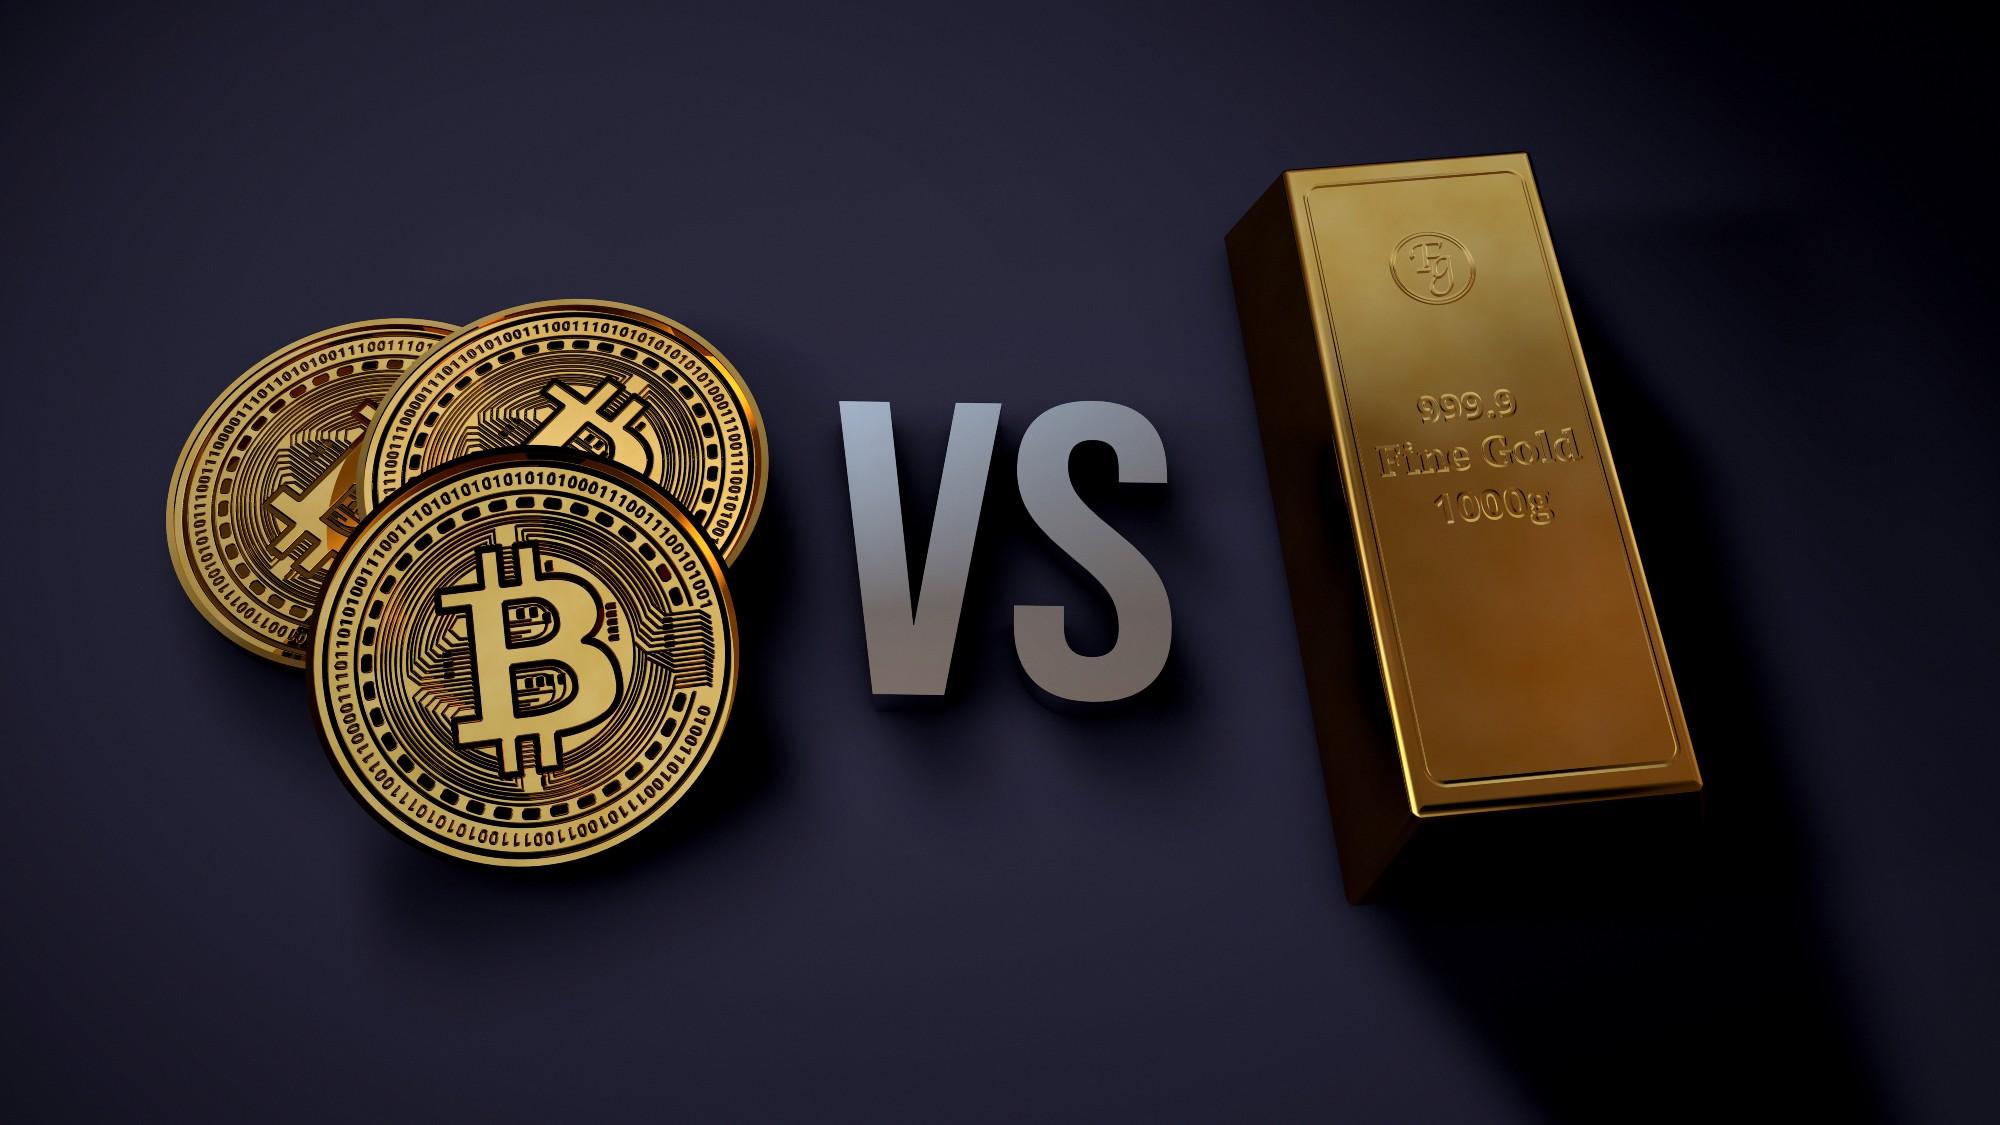 【MICA RESEARCH】輸入性通膨席捲全球,比特幣已取代黃金成抗通膨神器